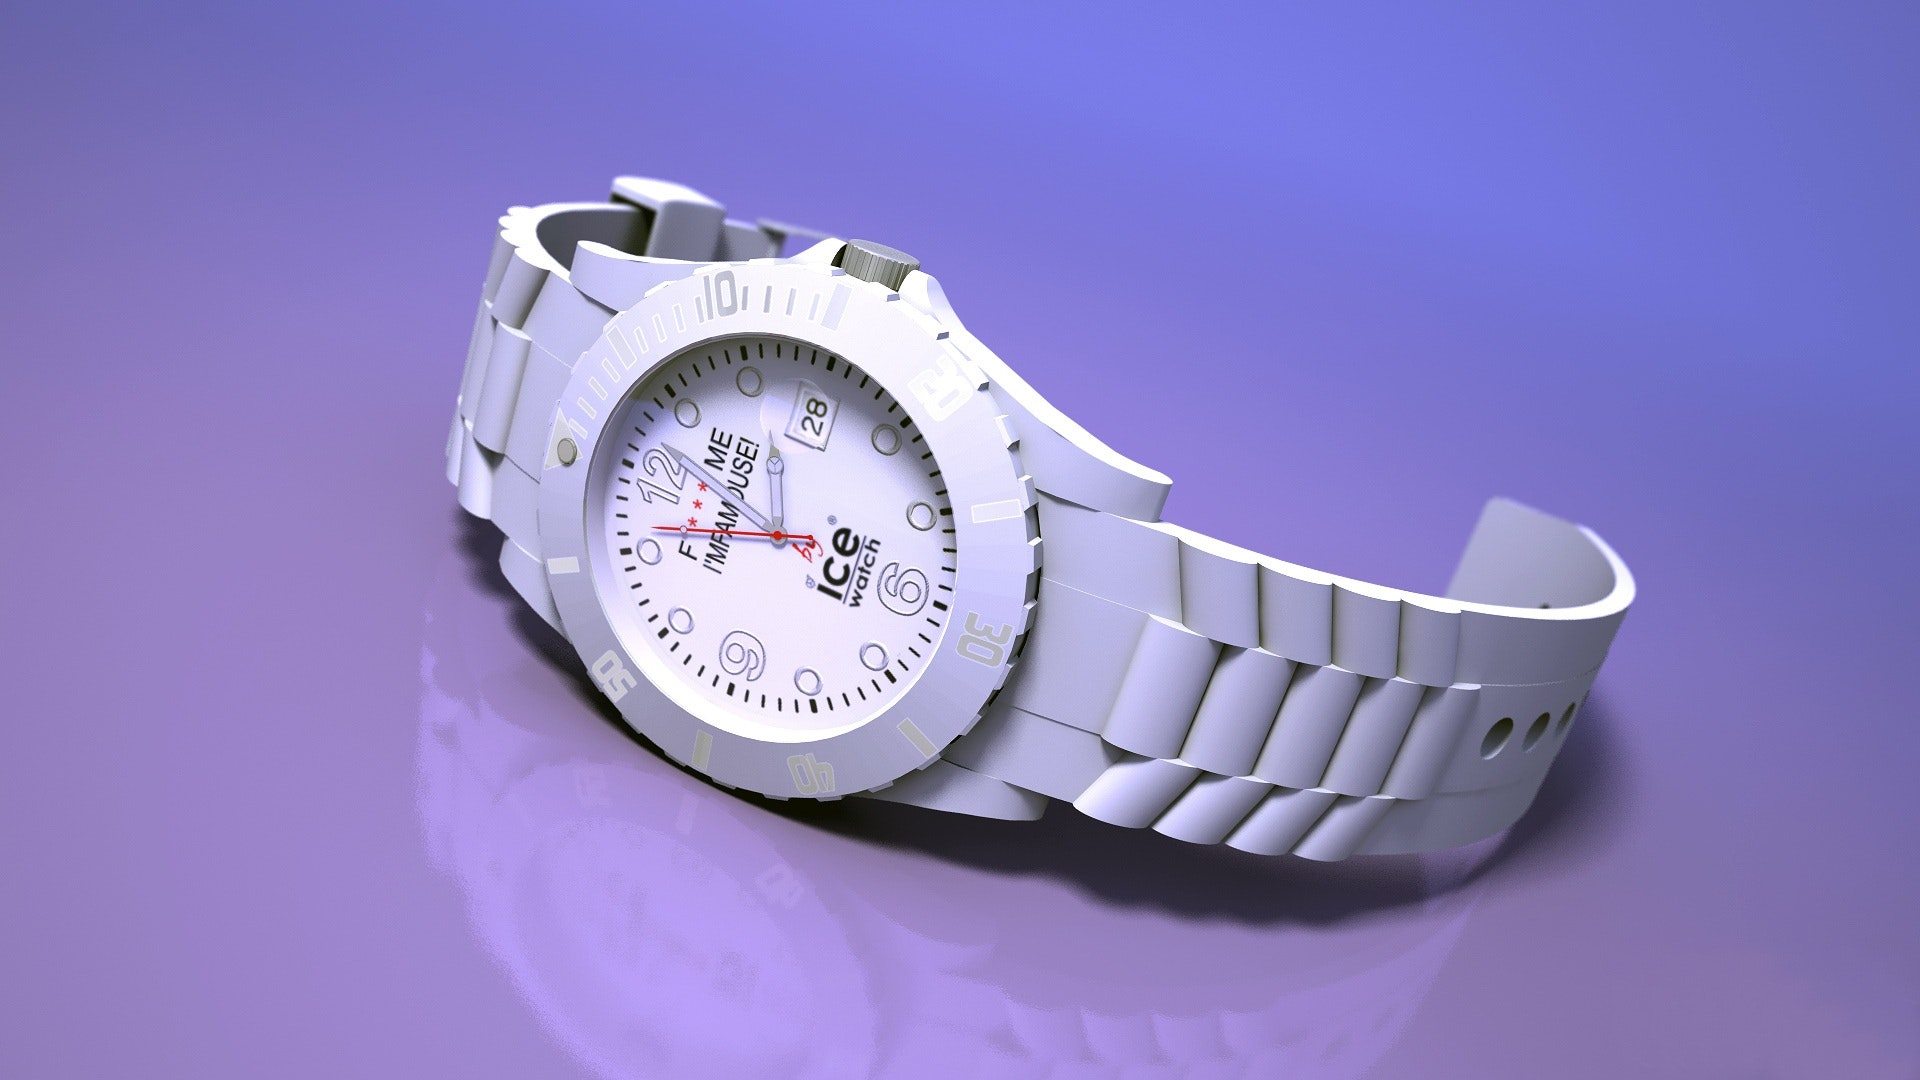 kostenloses foto zum thema apple watch arm armbanduhr. Black Bedroom Furniture Sets. Home Design Ideas